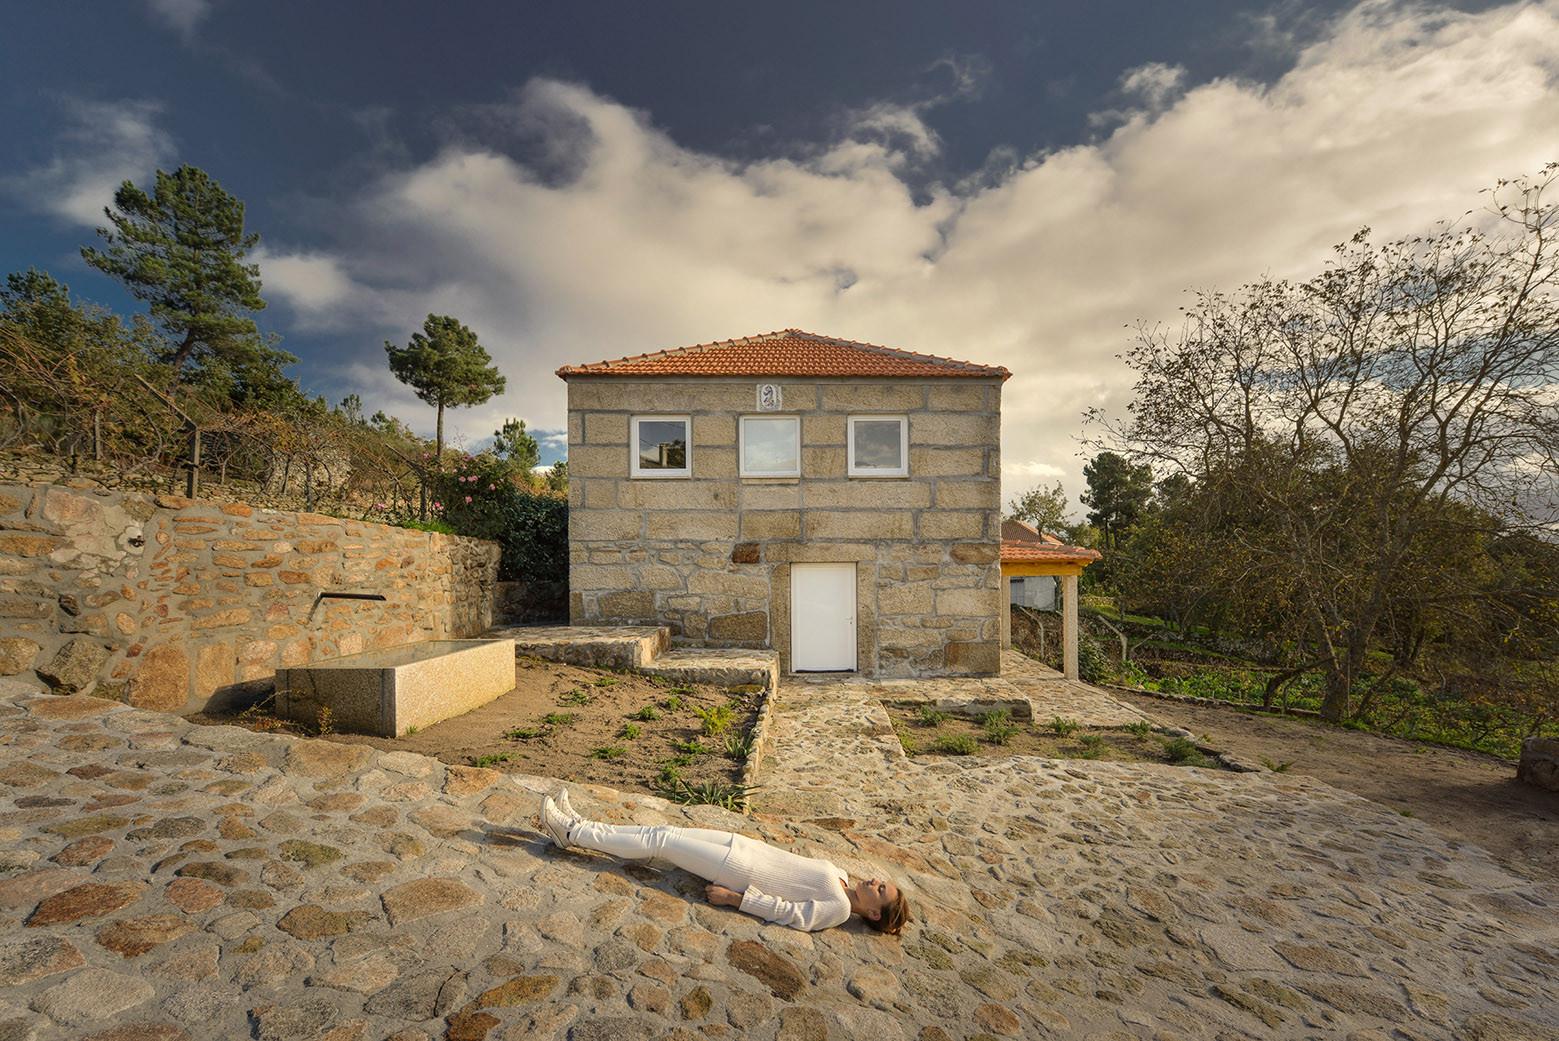 Estructura de Madera dentro de Muros de Piedra / Corpo Atelier